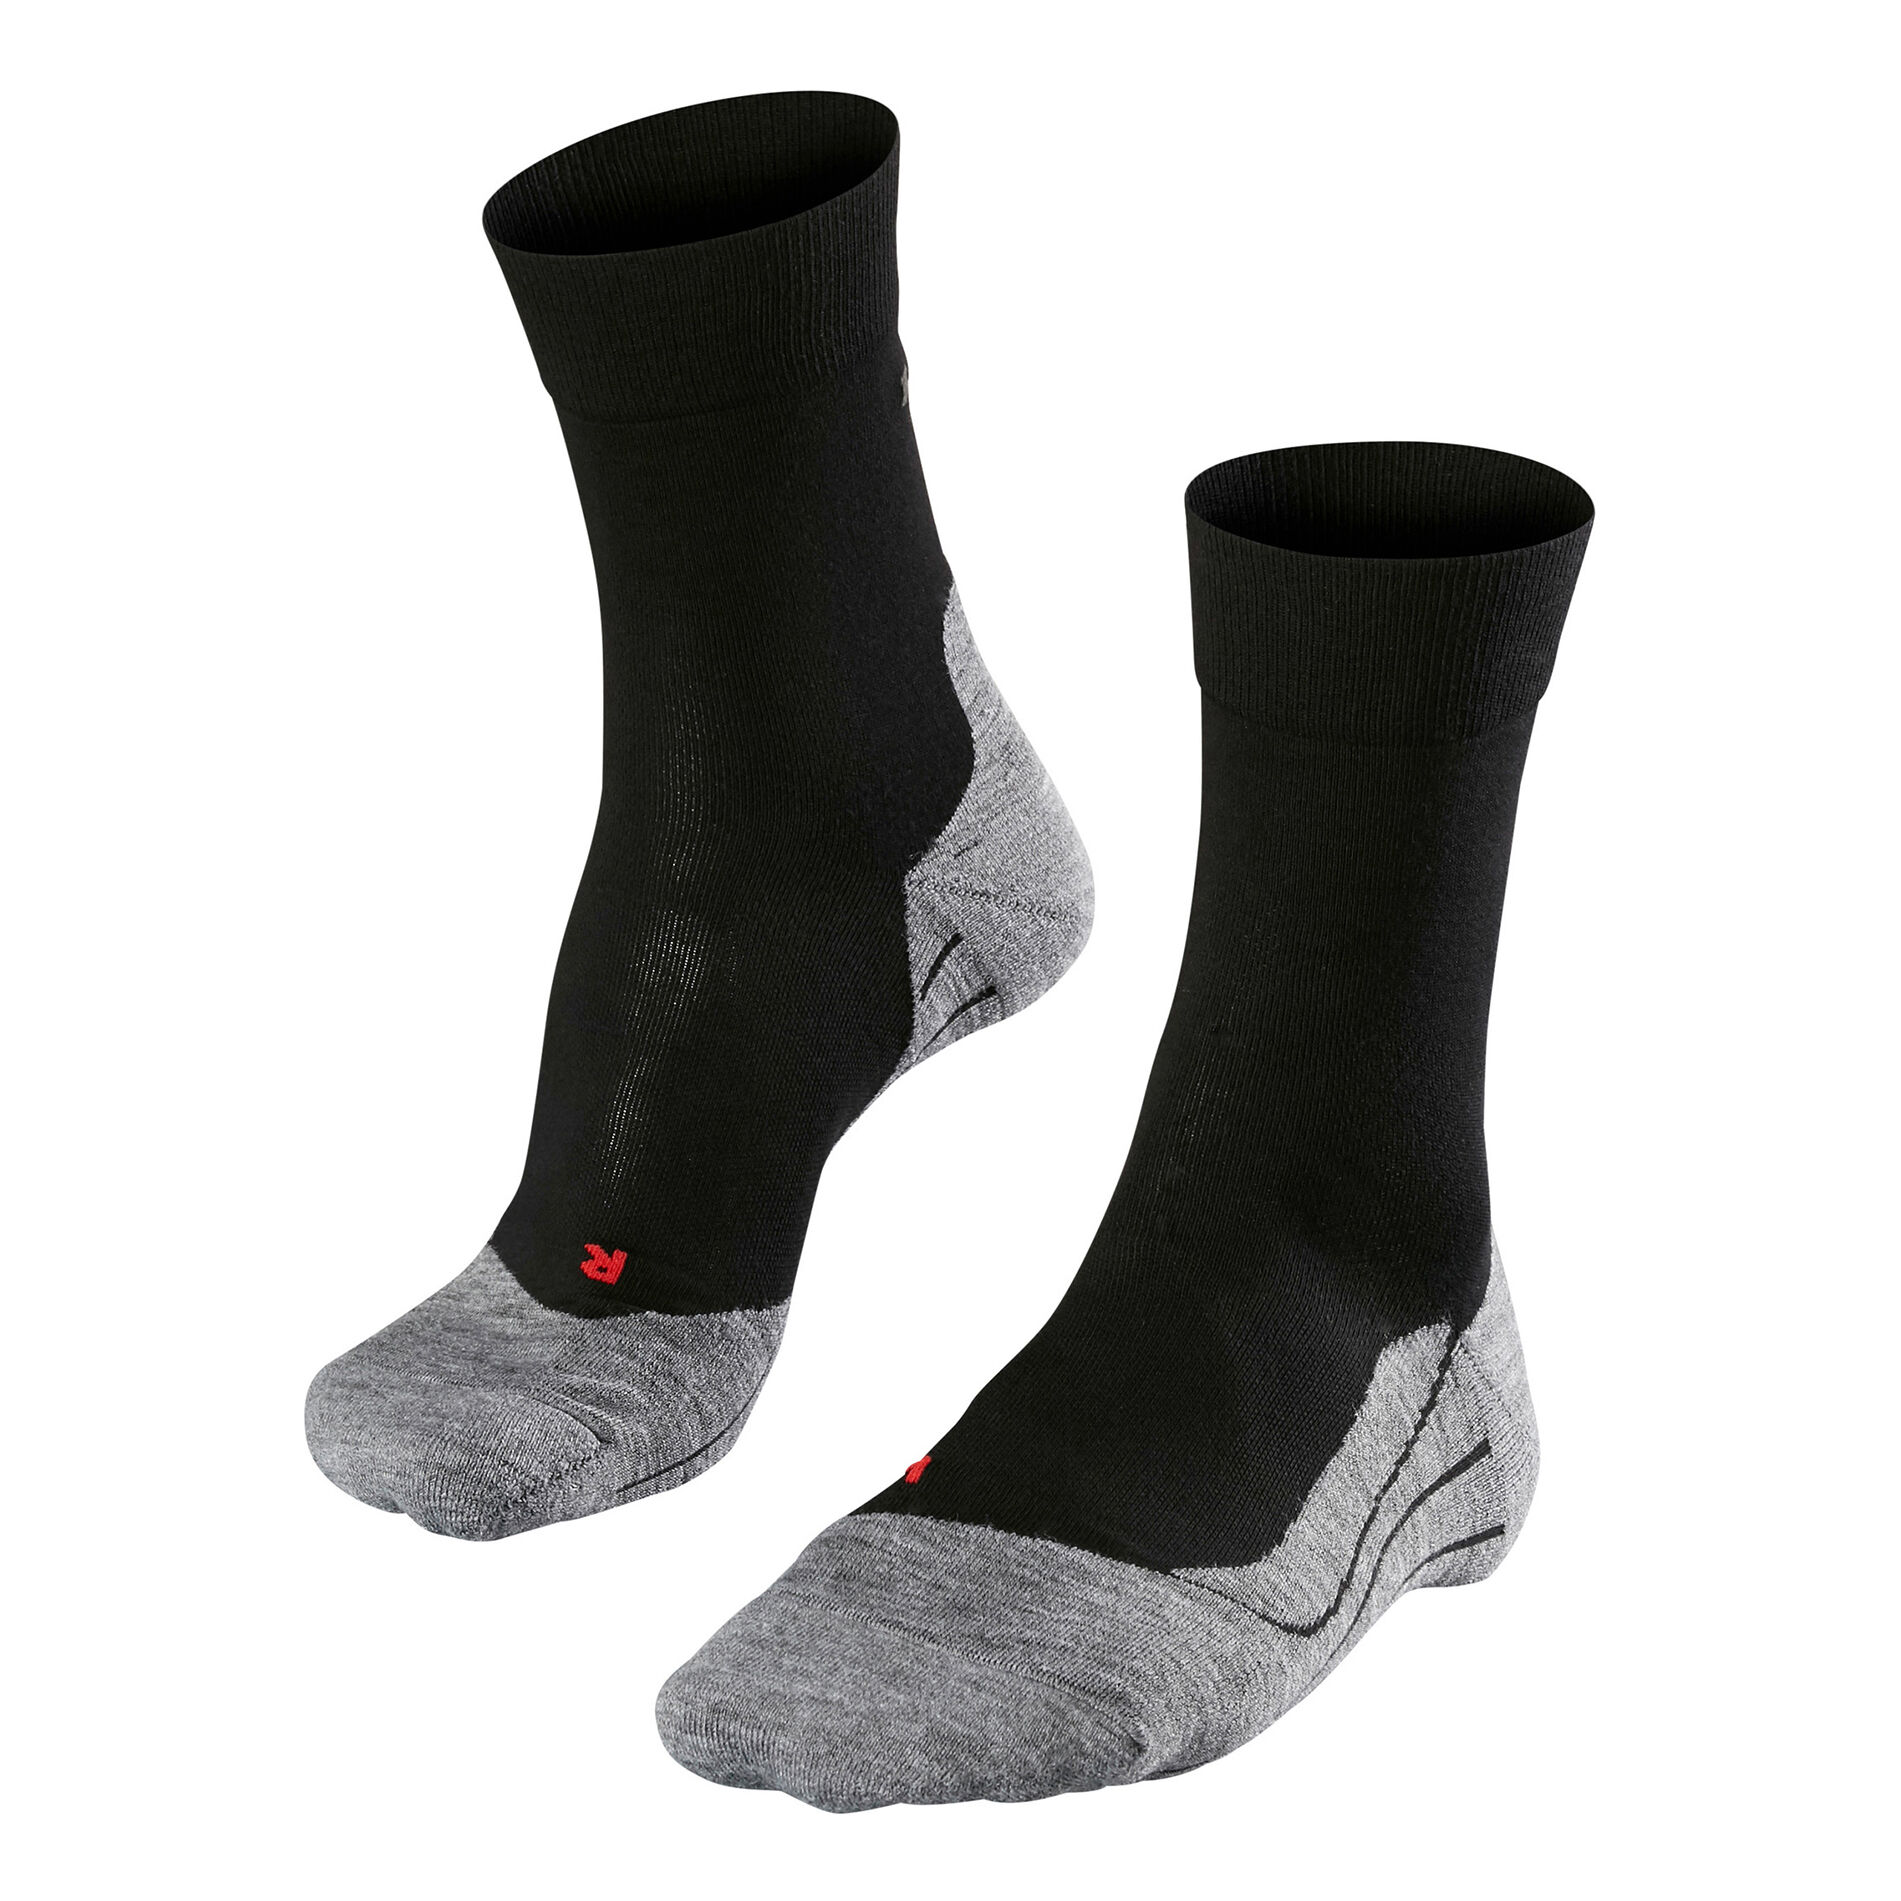 Herren Sneaker Socken Kurzsocke Quatersocks Sportsocken in